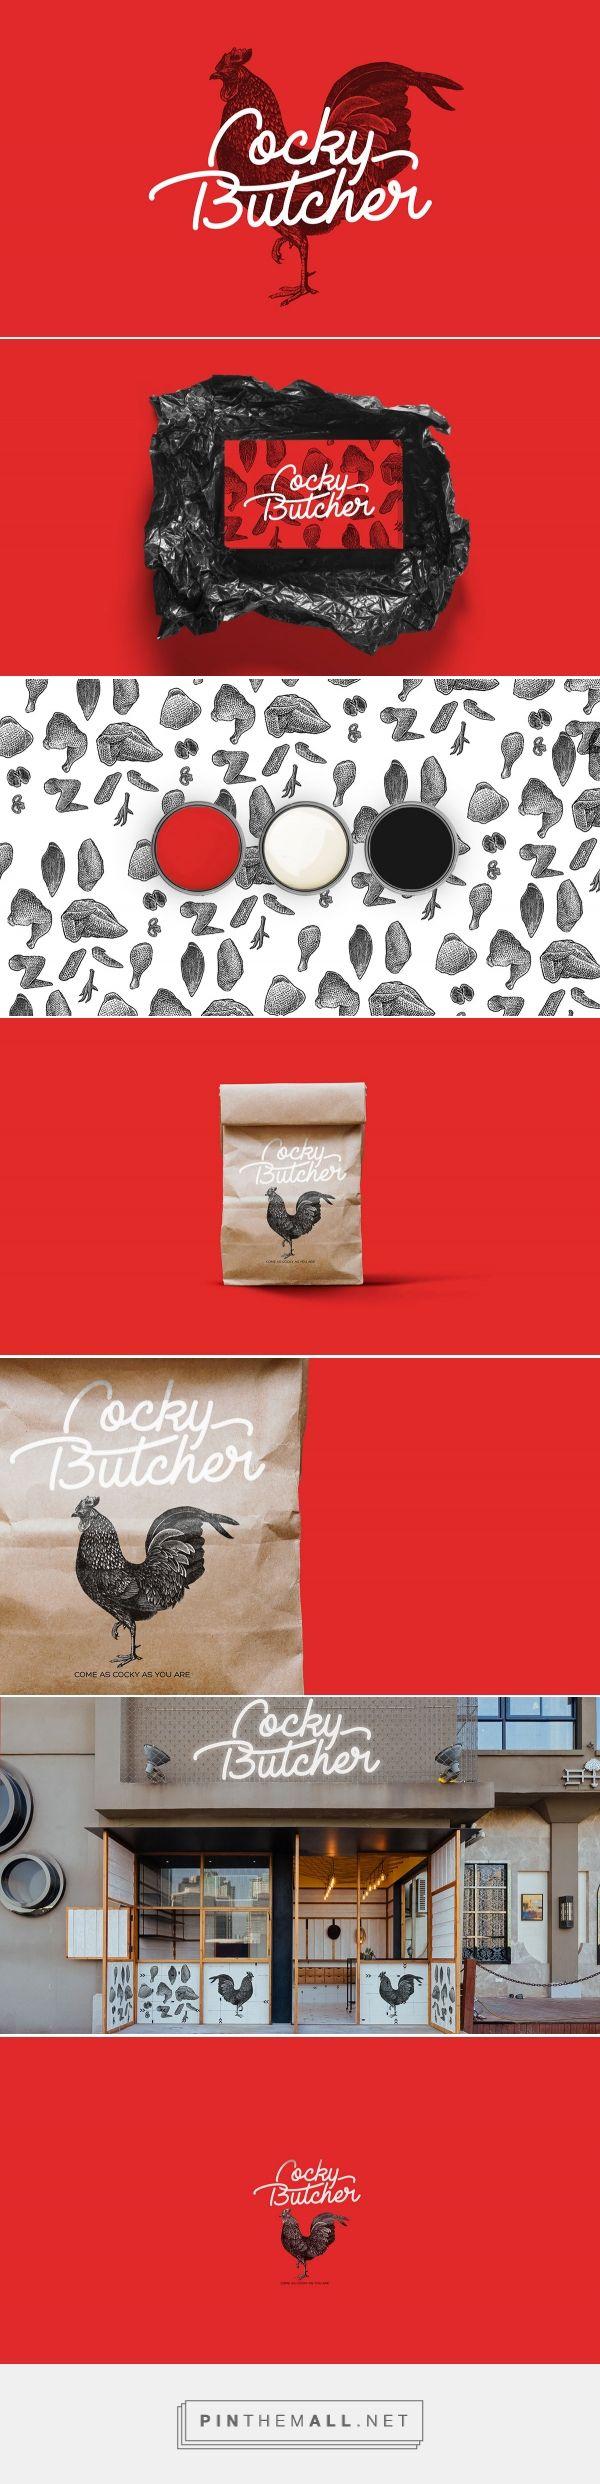 Cocky Butcher Branding By Rudolf Bou Saleh Fivestar Branding Agency Design And Branding Agency Curated Inspirat Branding Design Branding Corporate Design